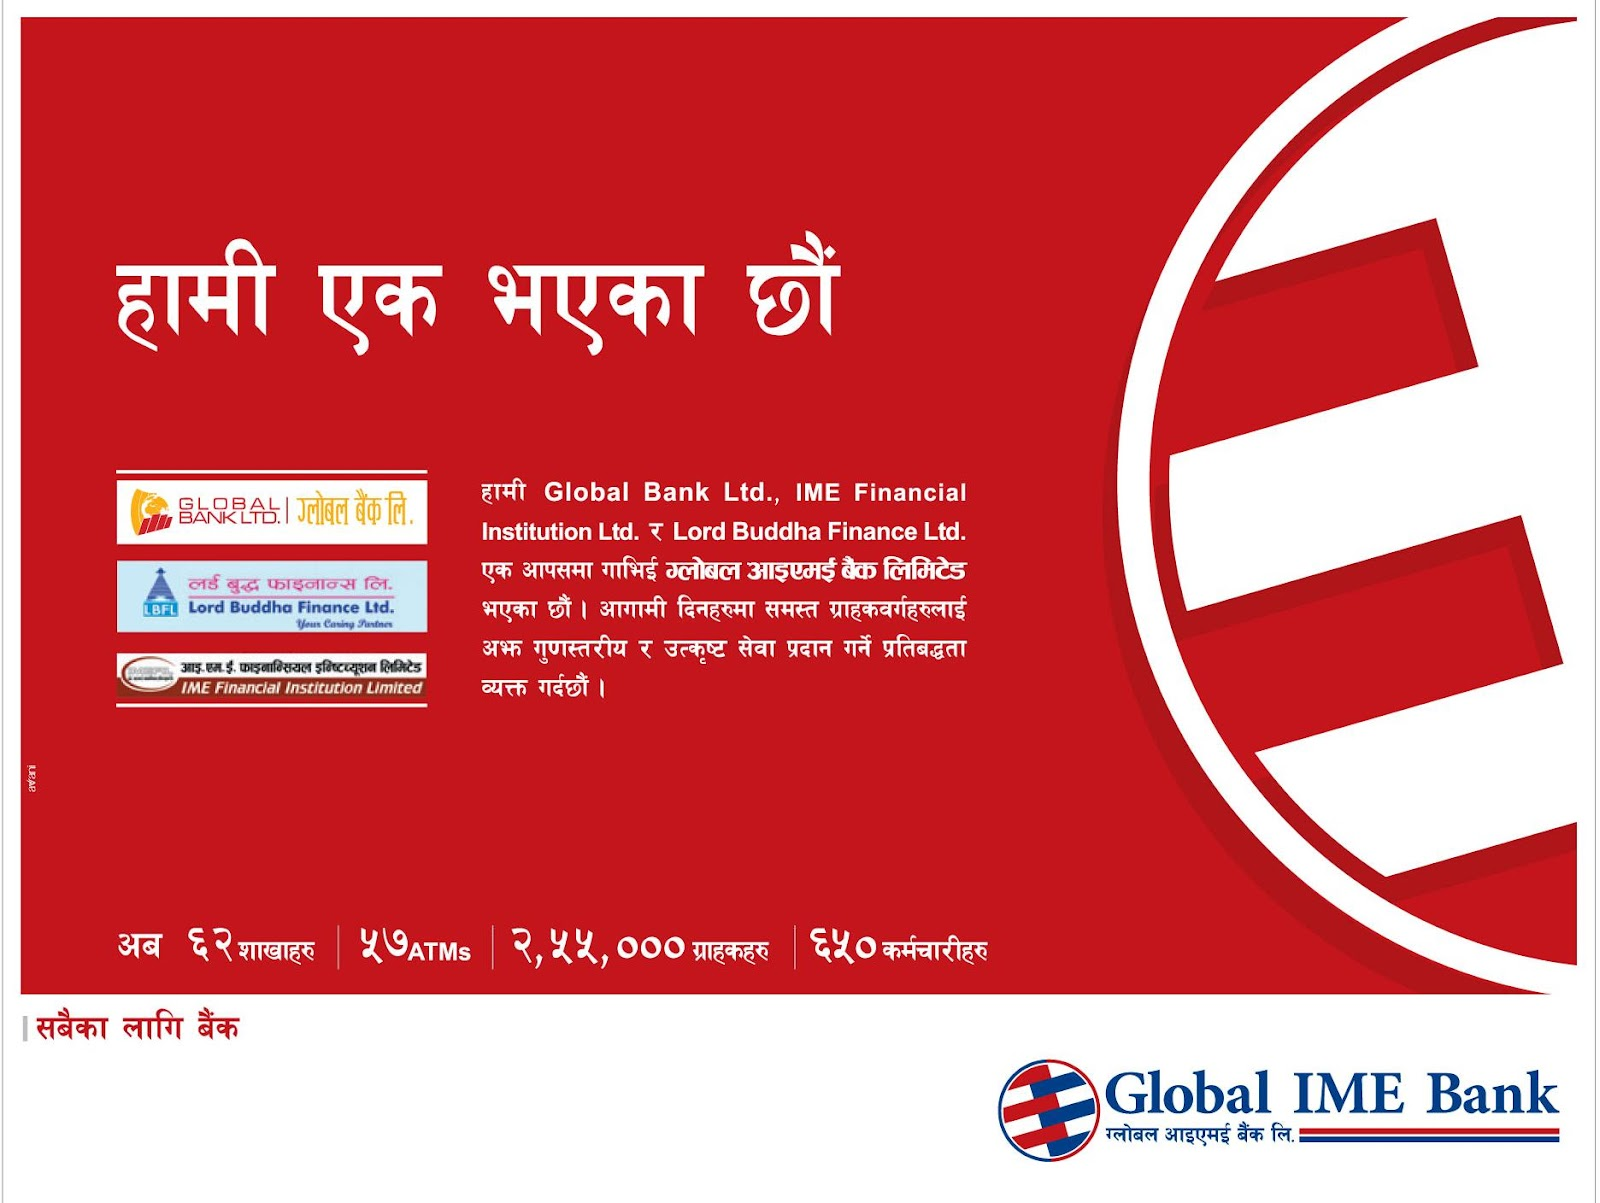 global ime bank nepal